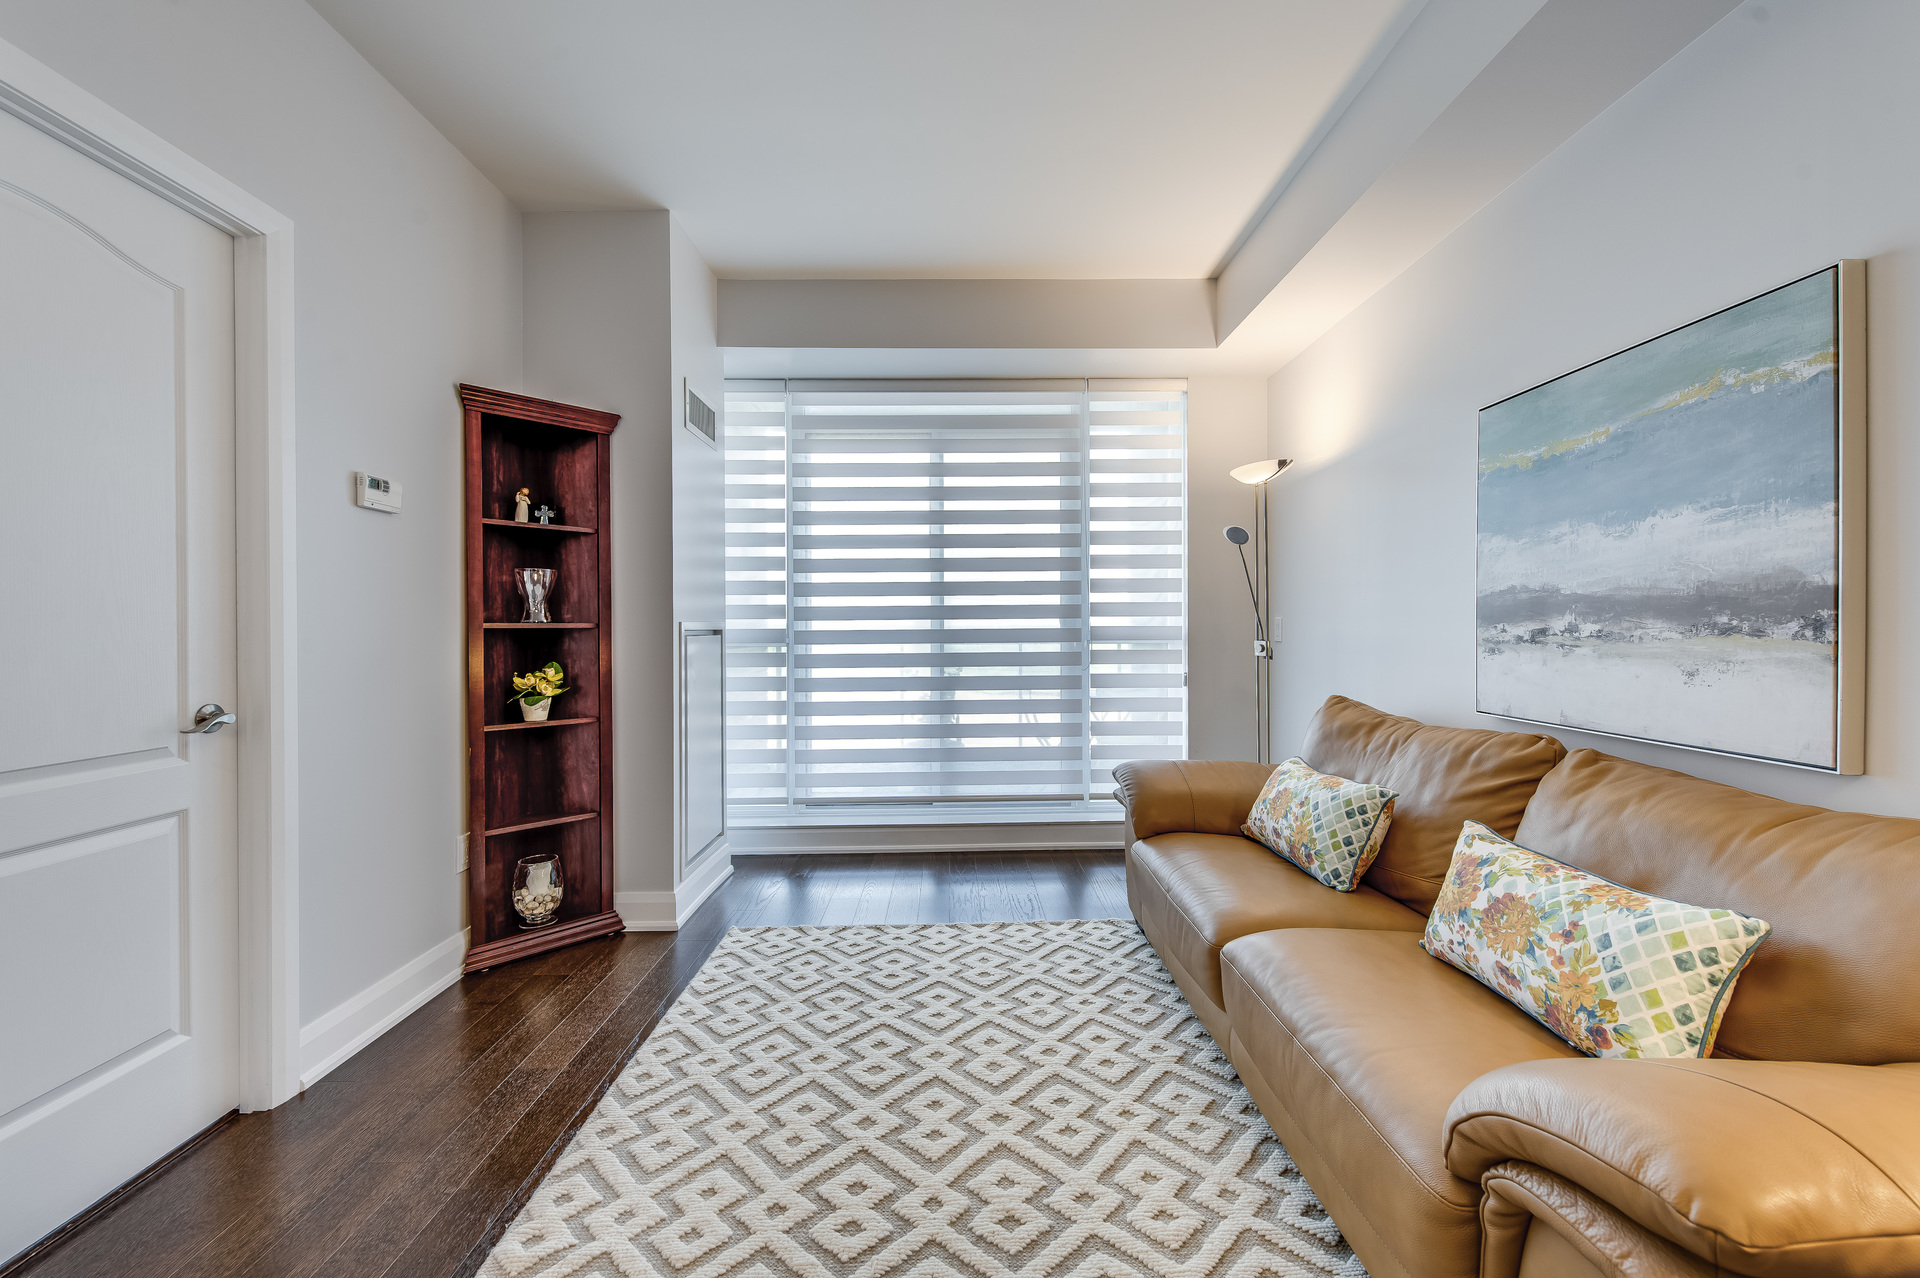 Living Room - 514-2480 Price Michael Dr, Oakville - Elite3 & Team at 514 - 2480 Prince Michael Drive, Iroquois Ridge North, Oakville